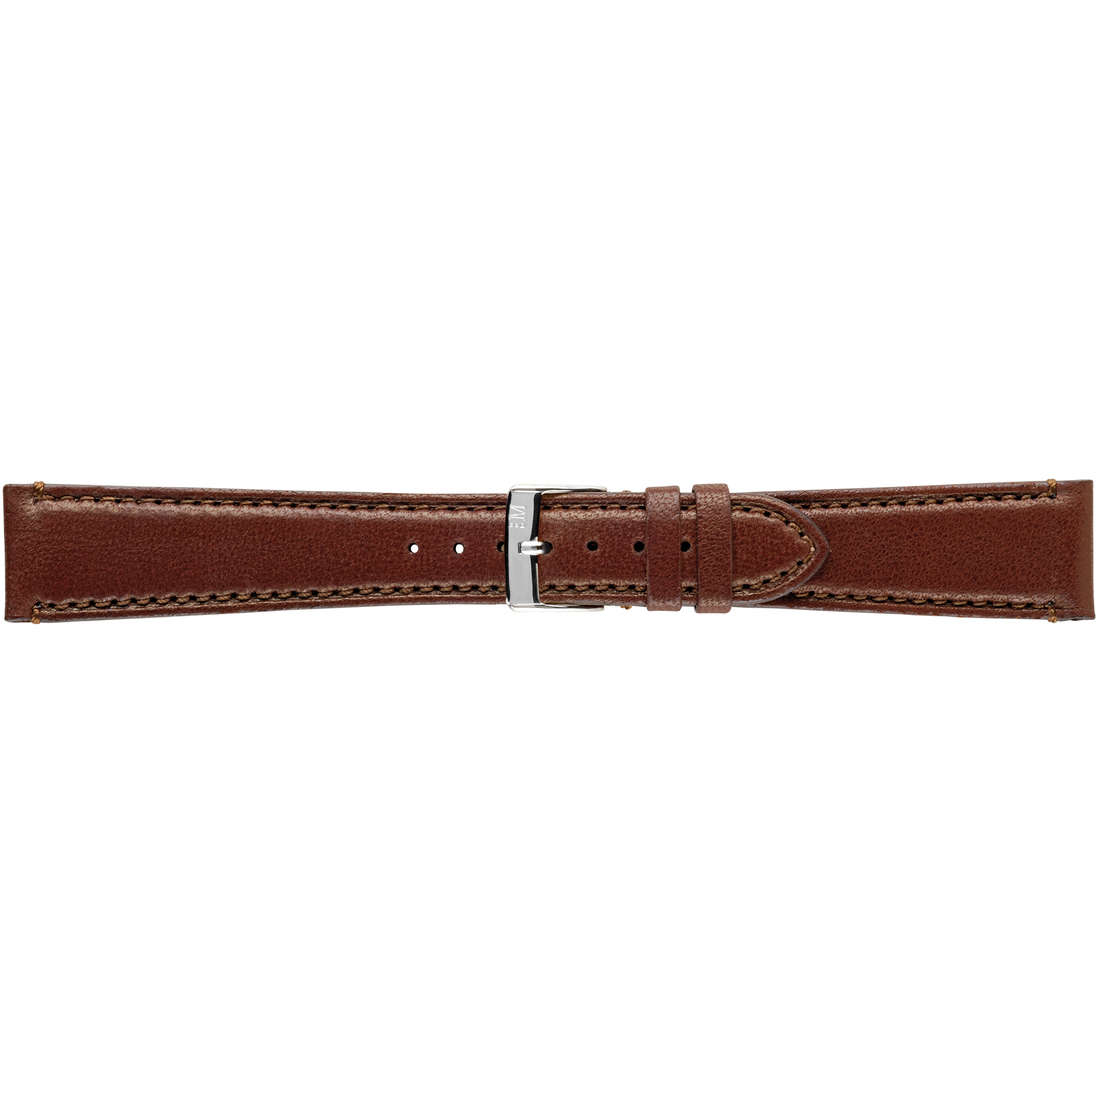 watch watch bands watch straps man Morellato Manufatti A01X3495006030CR16